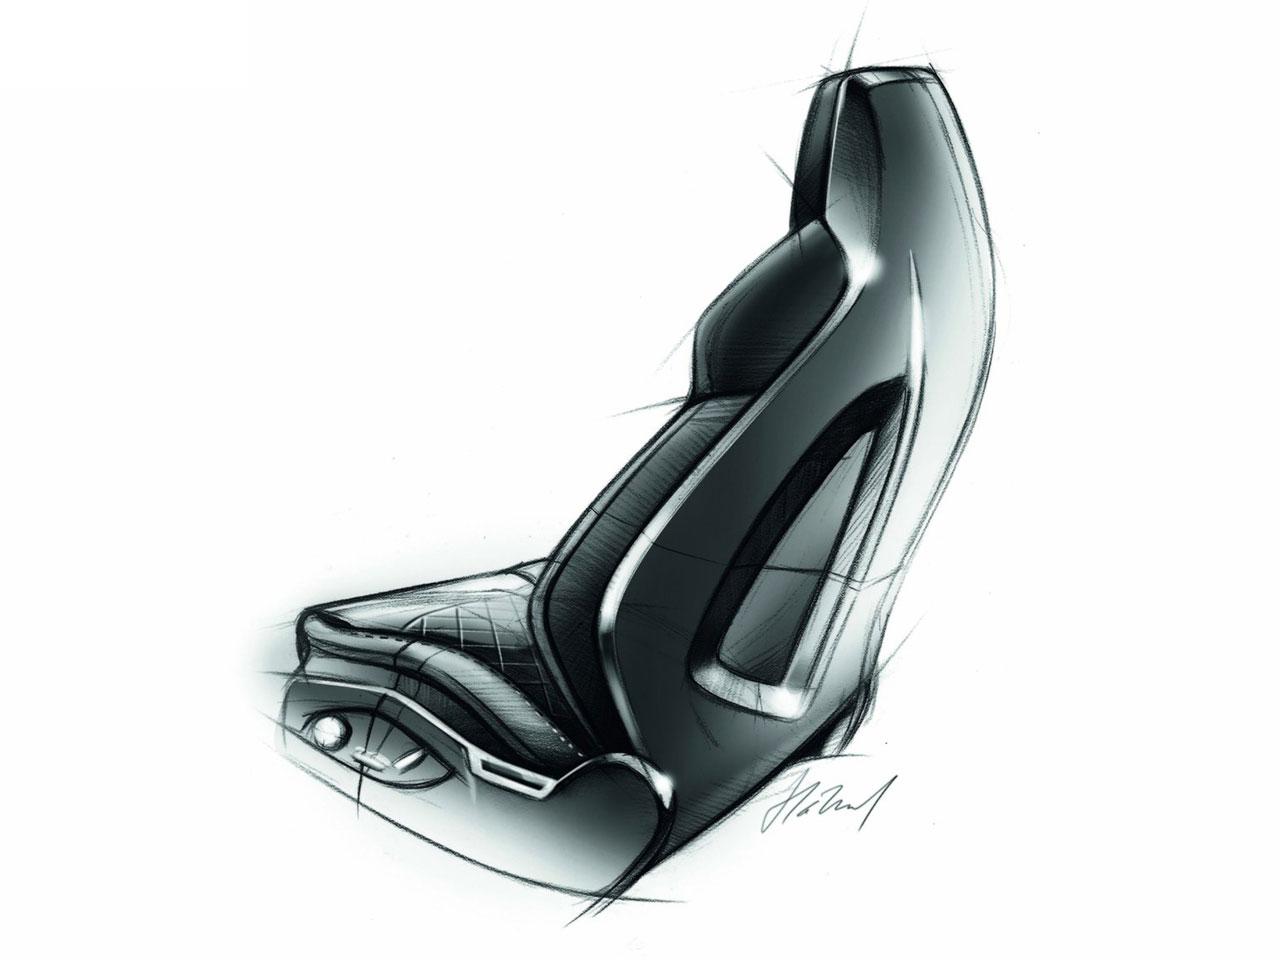 Audi A7 Sportback Seat Design Sketch Car Body Design